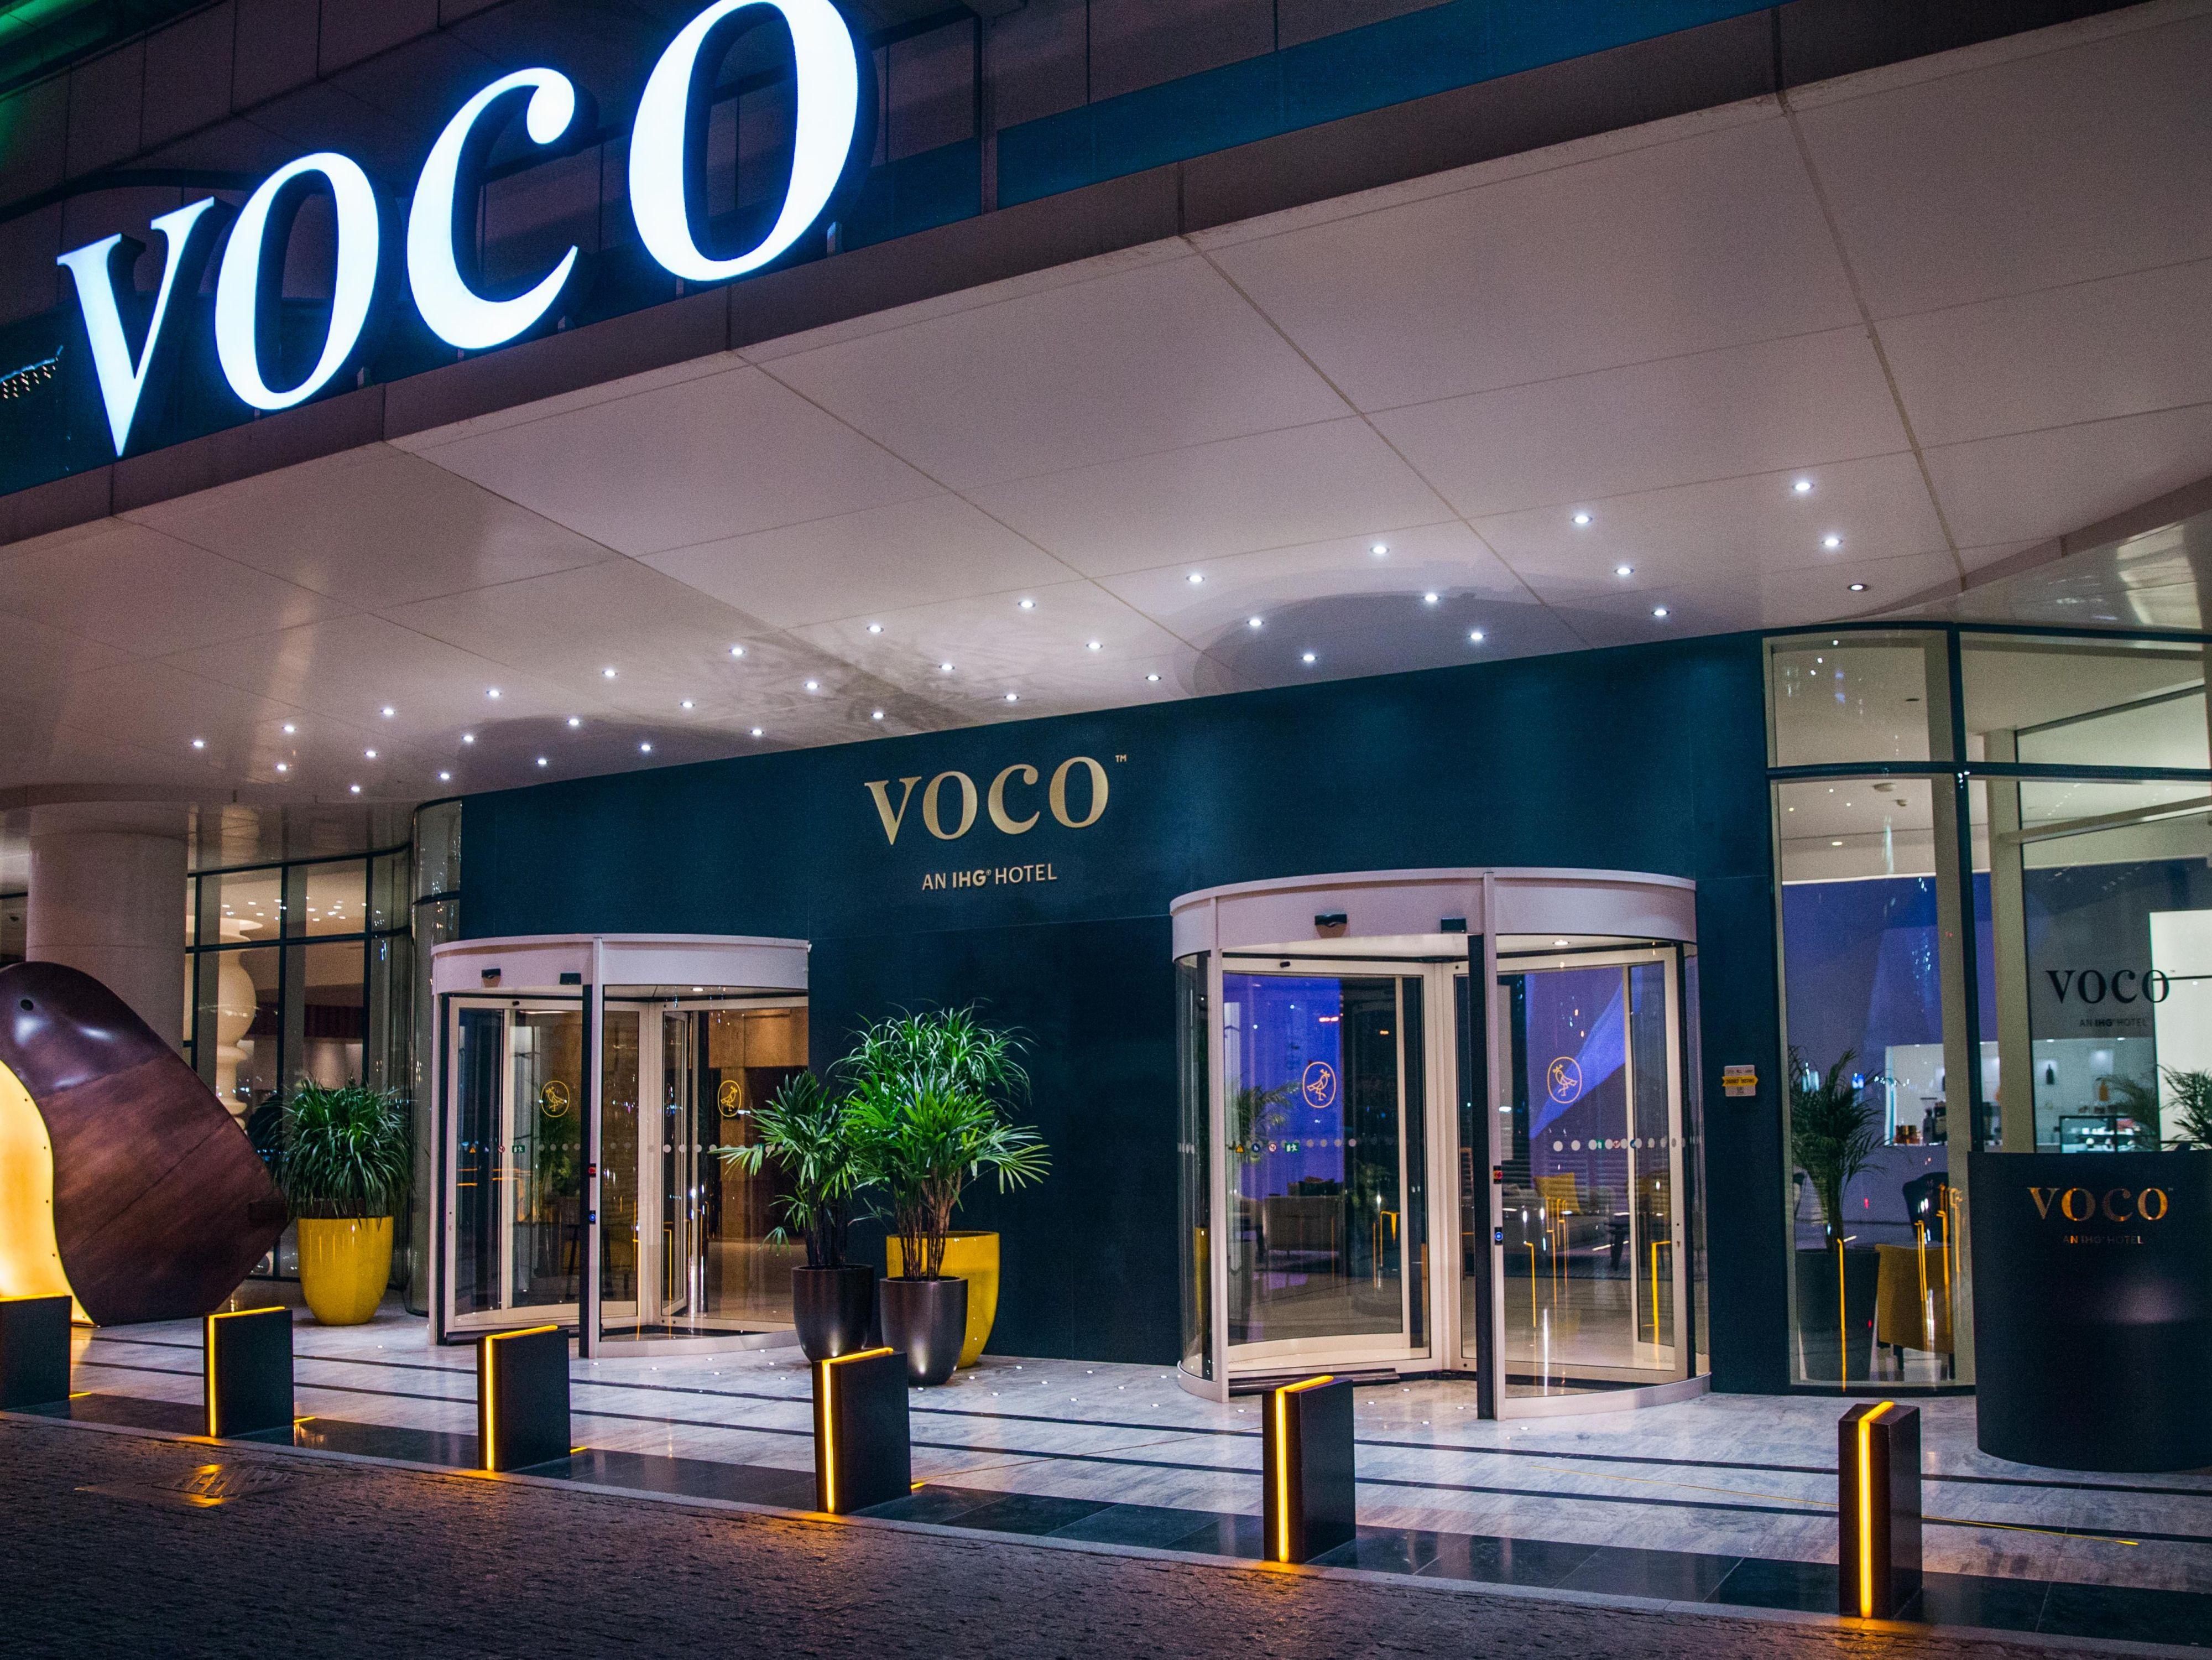 Voco Dubai Hotel 5 Star Hotel Near Dubai World Trade Center